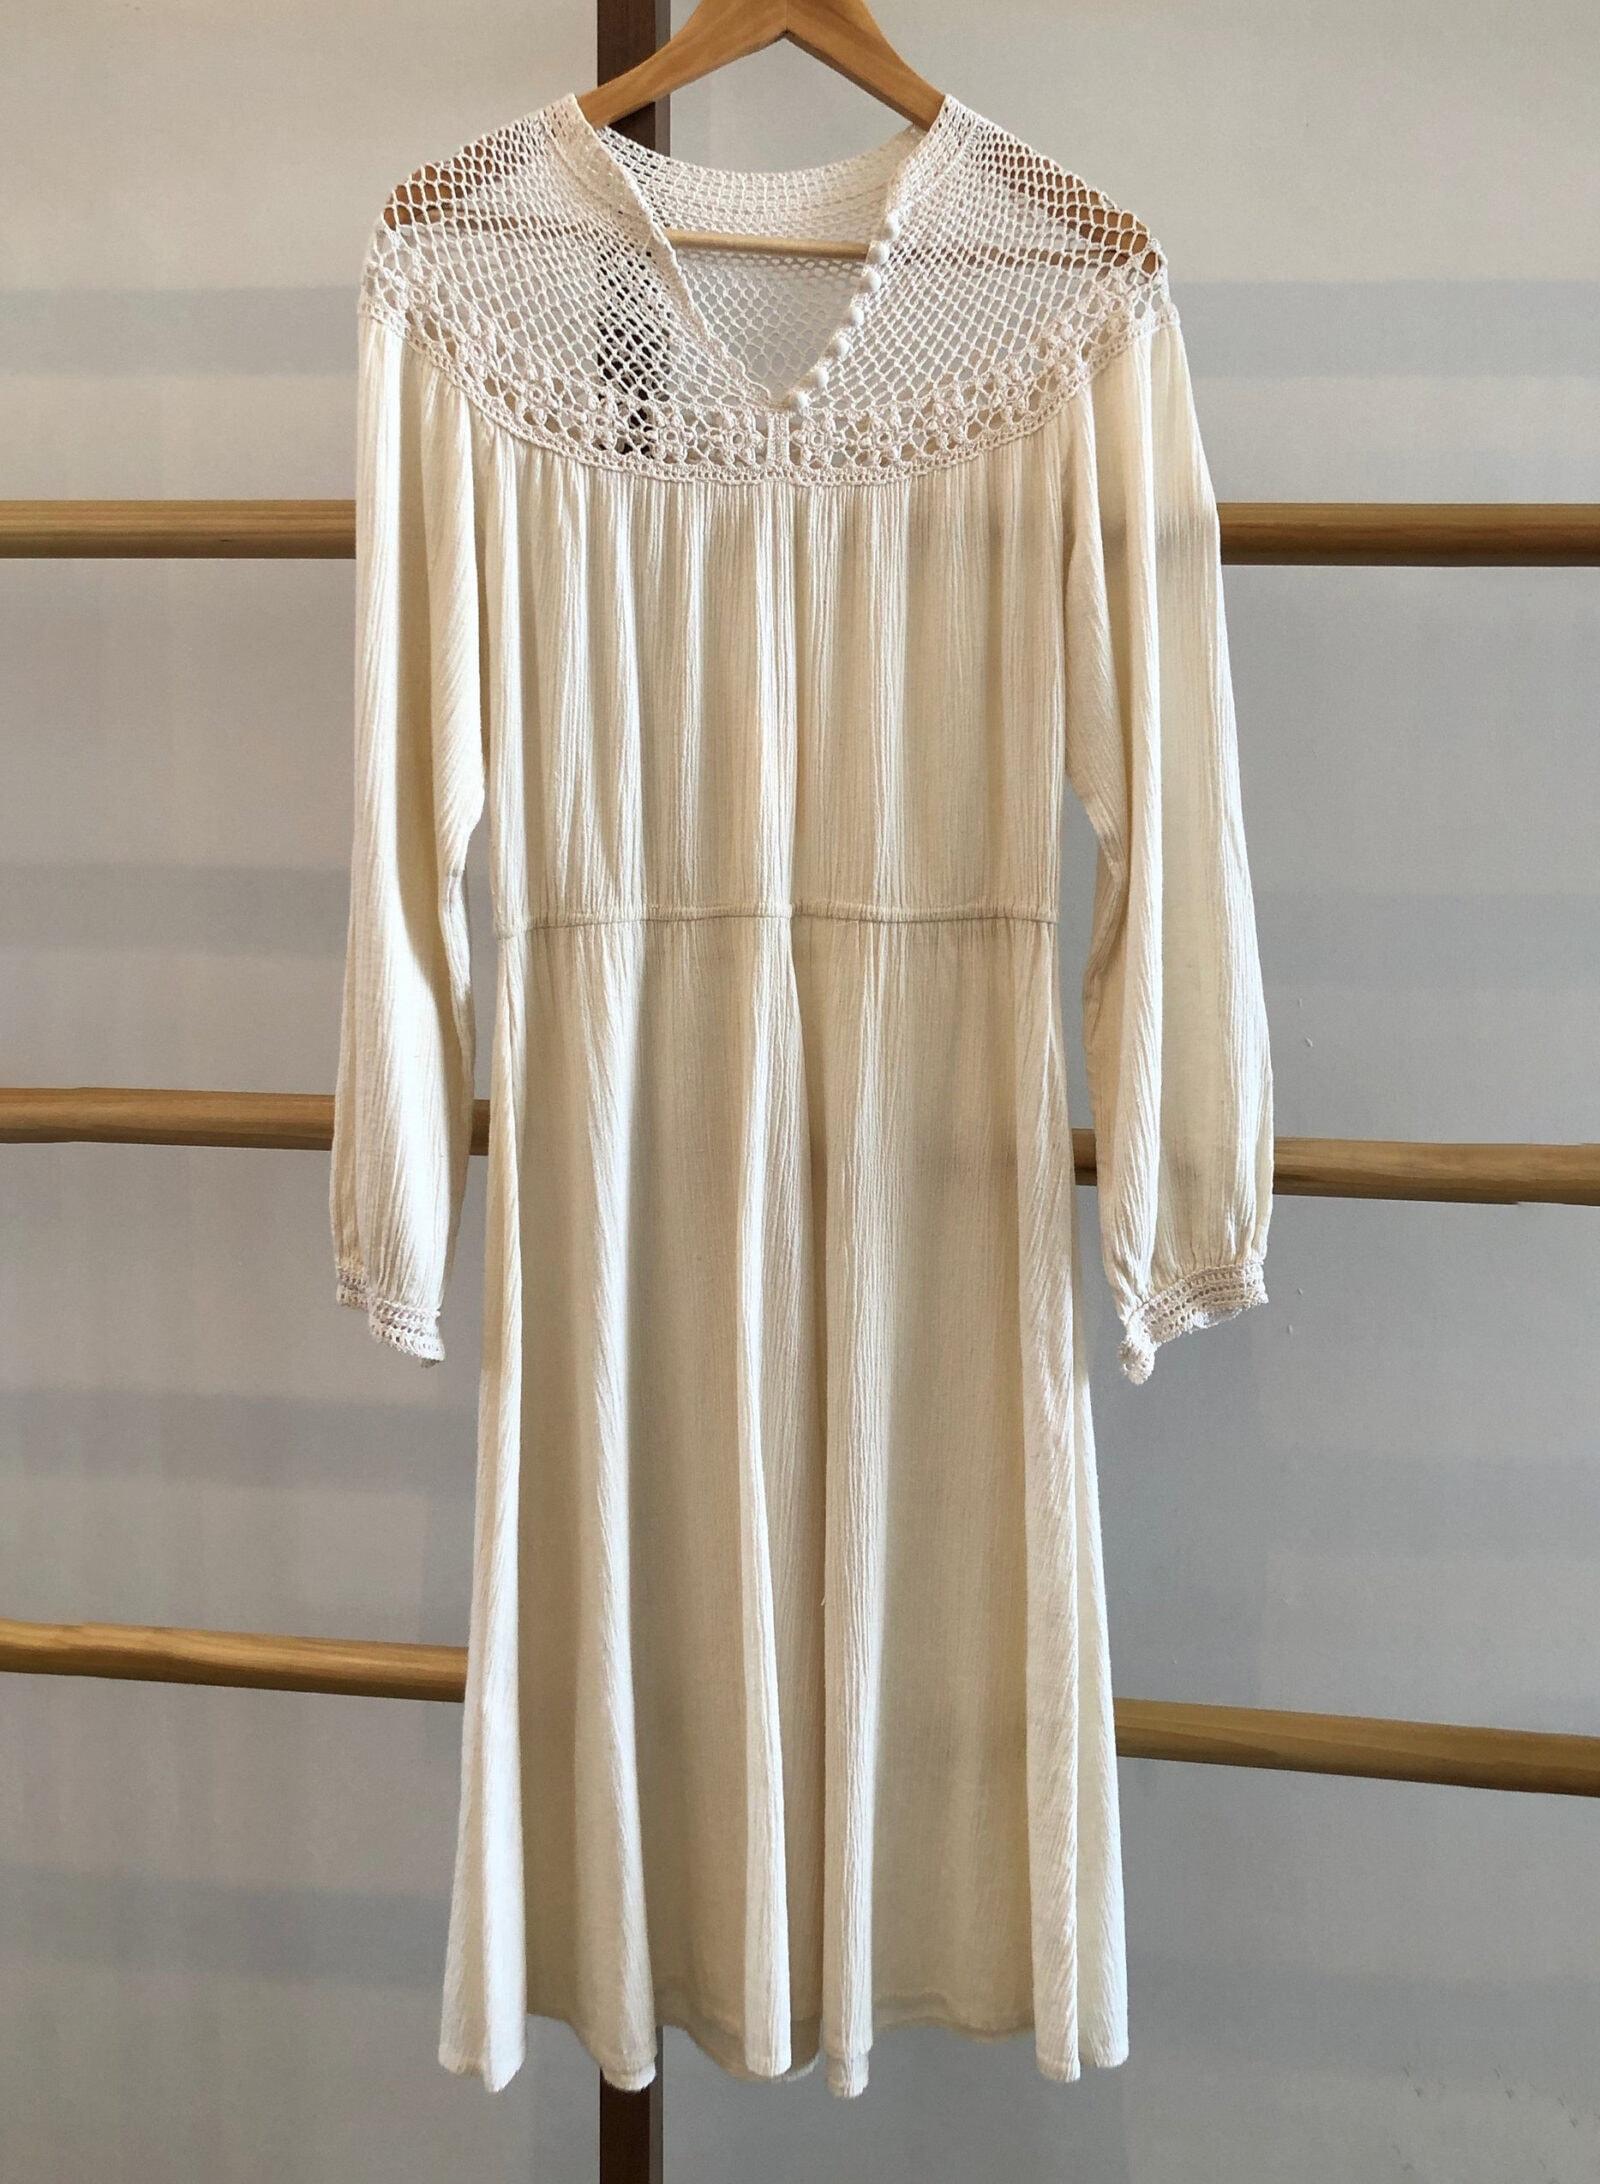 Vintage Cotton and Crochet Dress